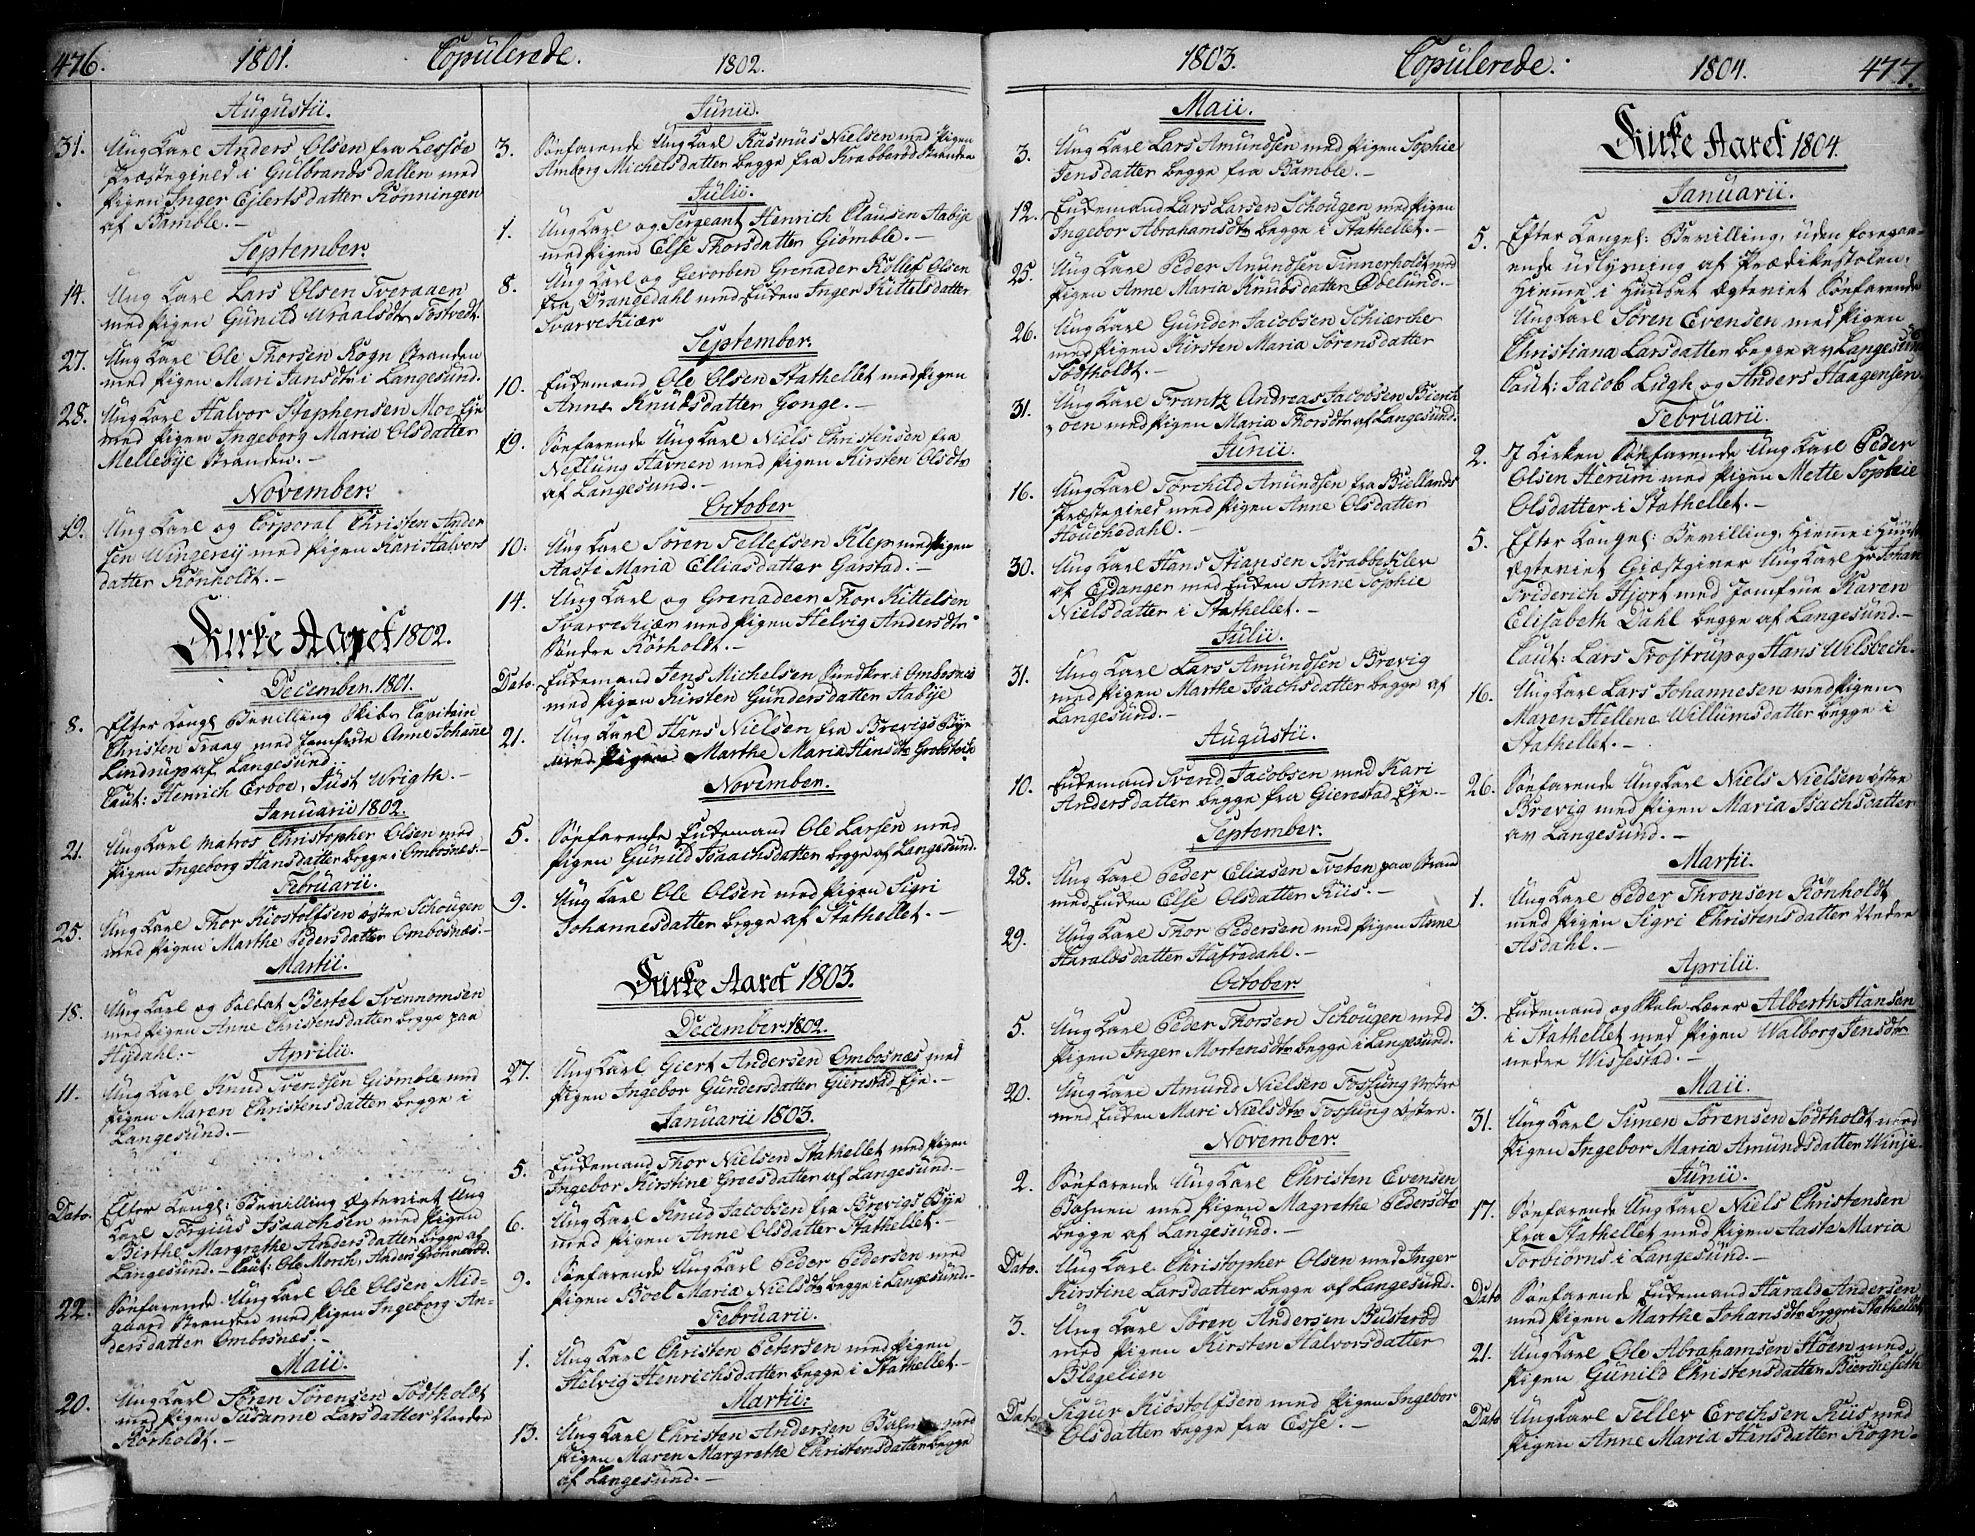 SAKO, Bamble kirkebøker, F/Fa/L0002: Ministerialbok nr. I 2, 1775-1814, s. 476-477